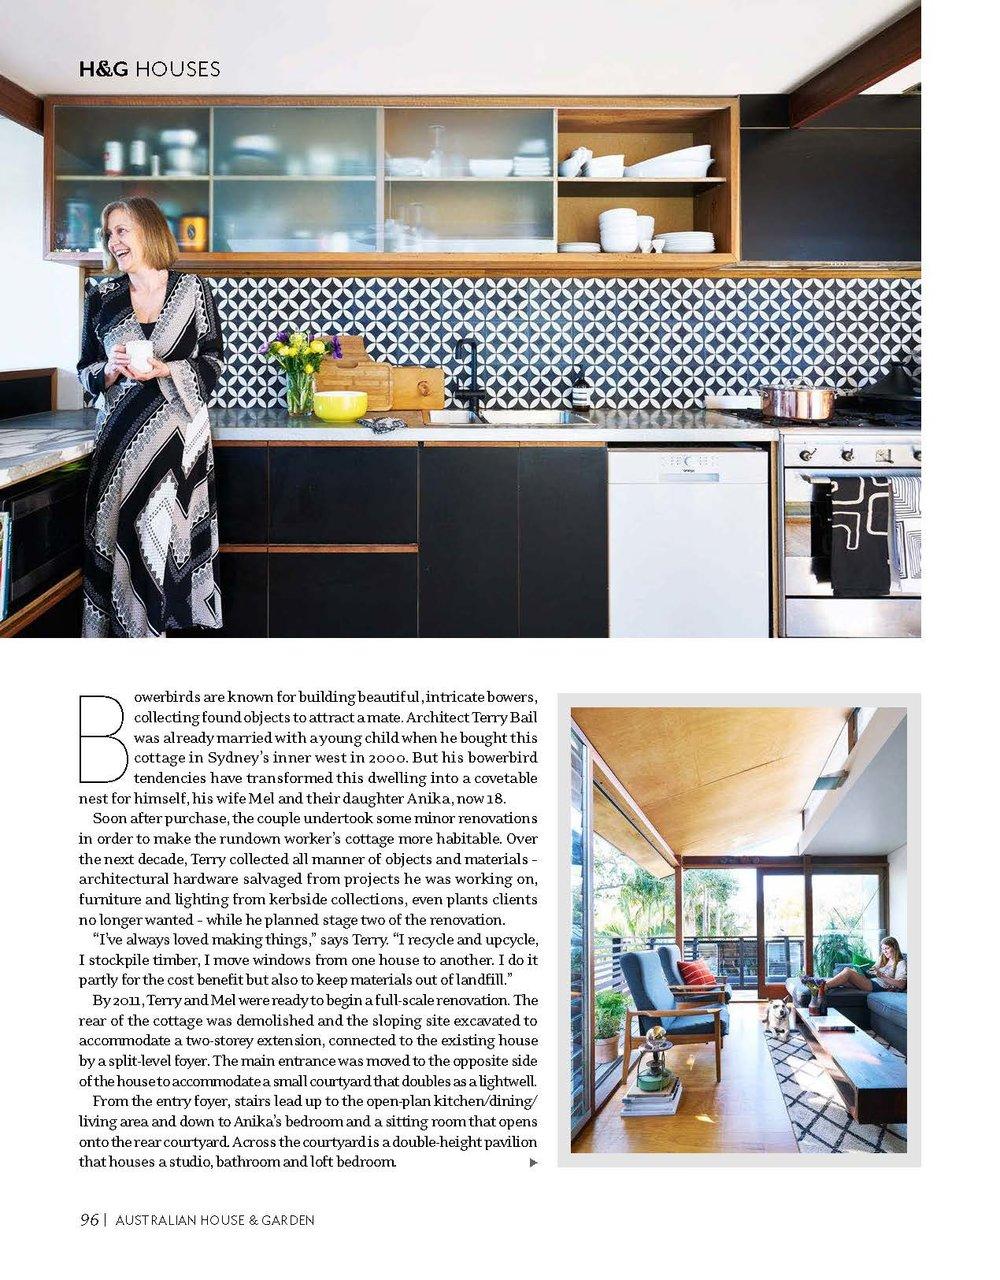 Australian House & Garden - January 2017_Page_096.jpg